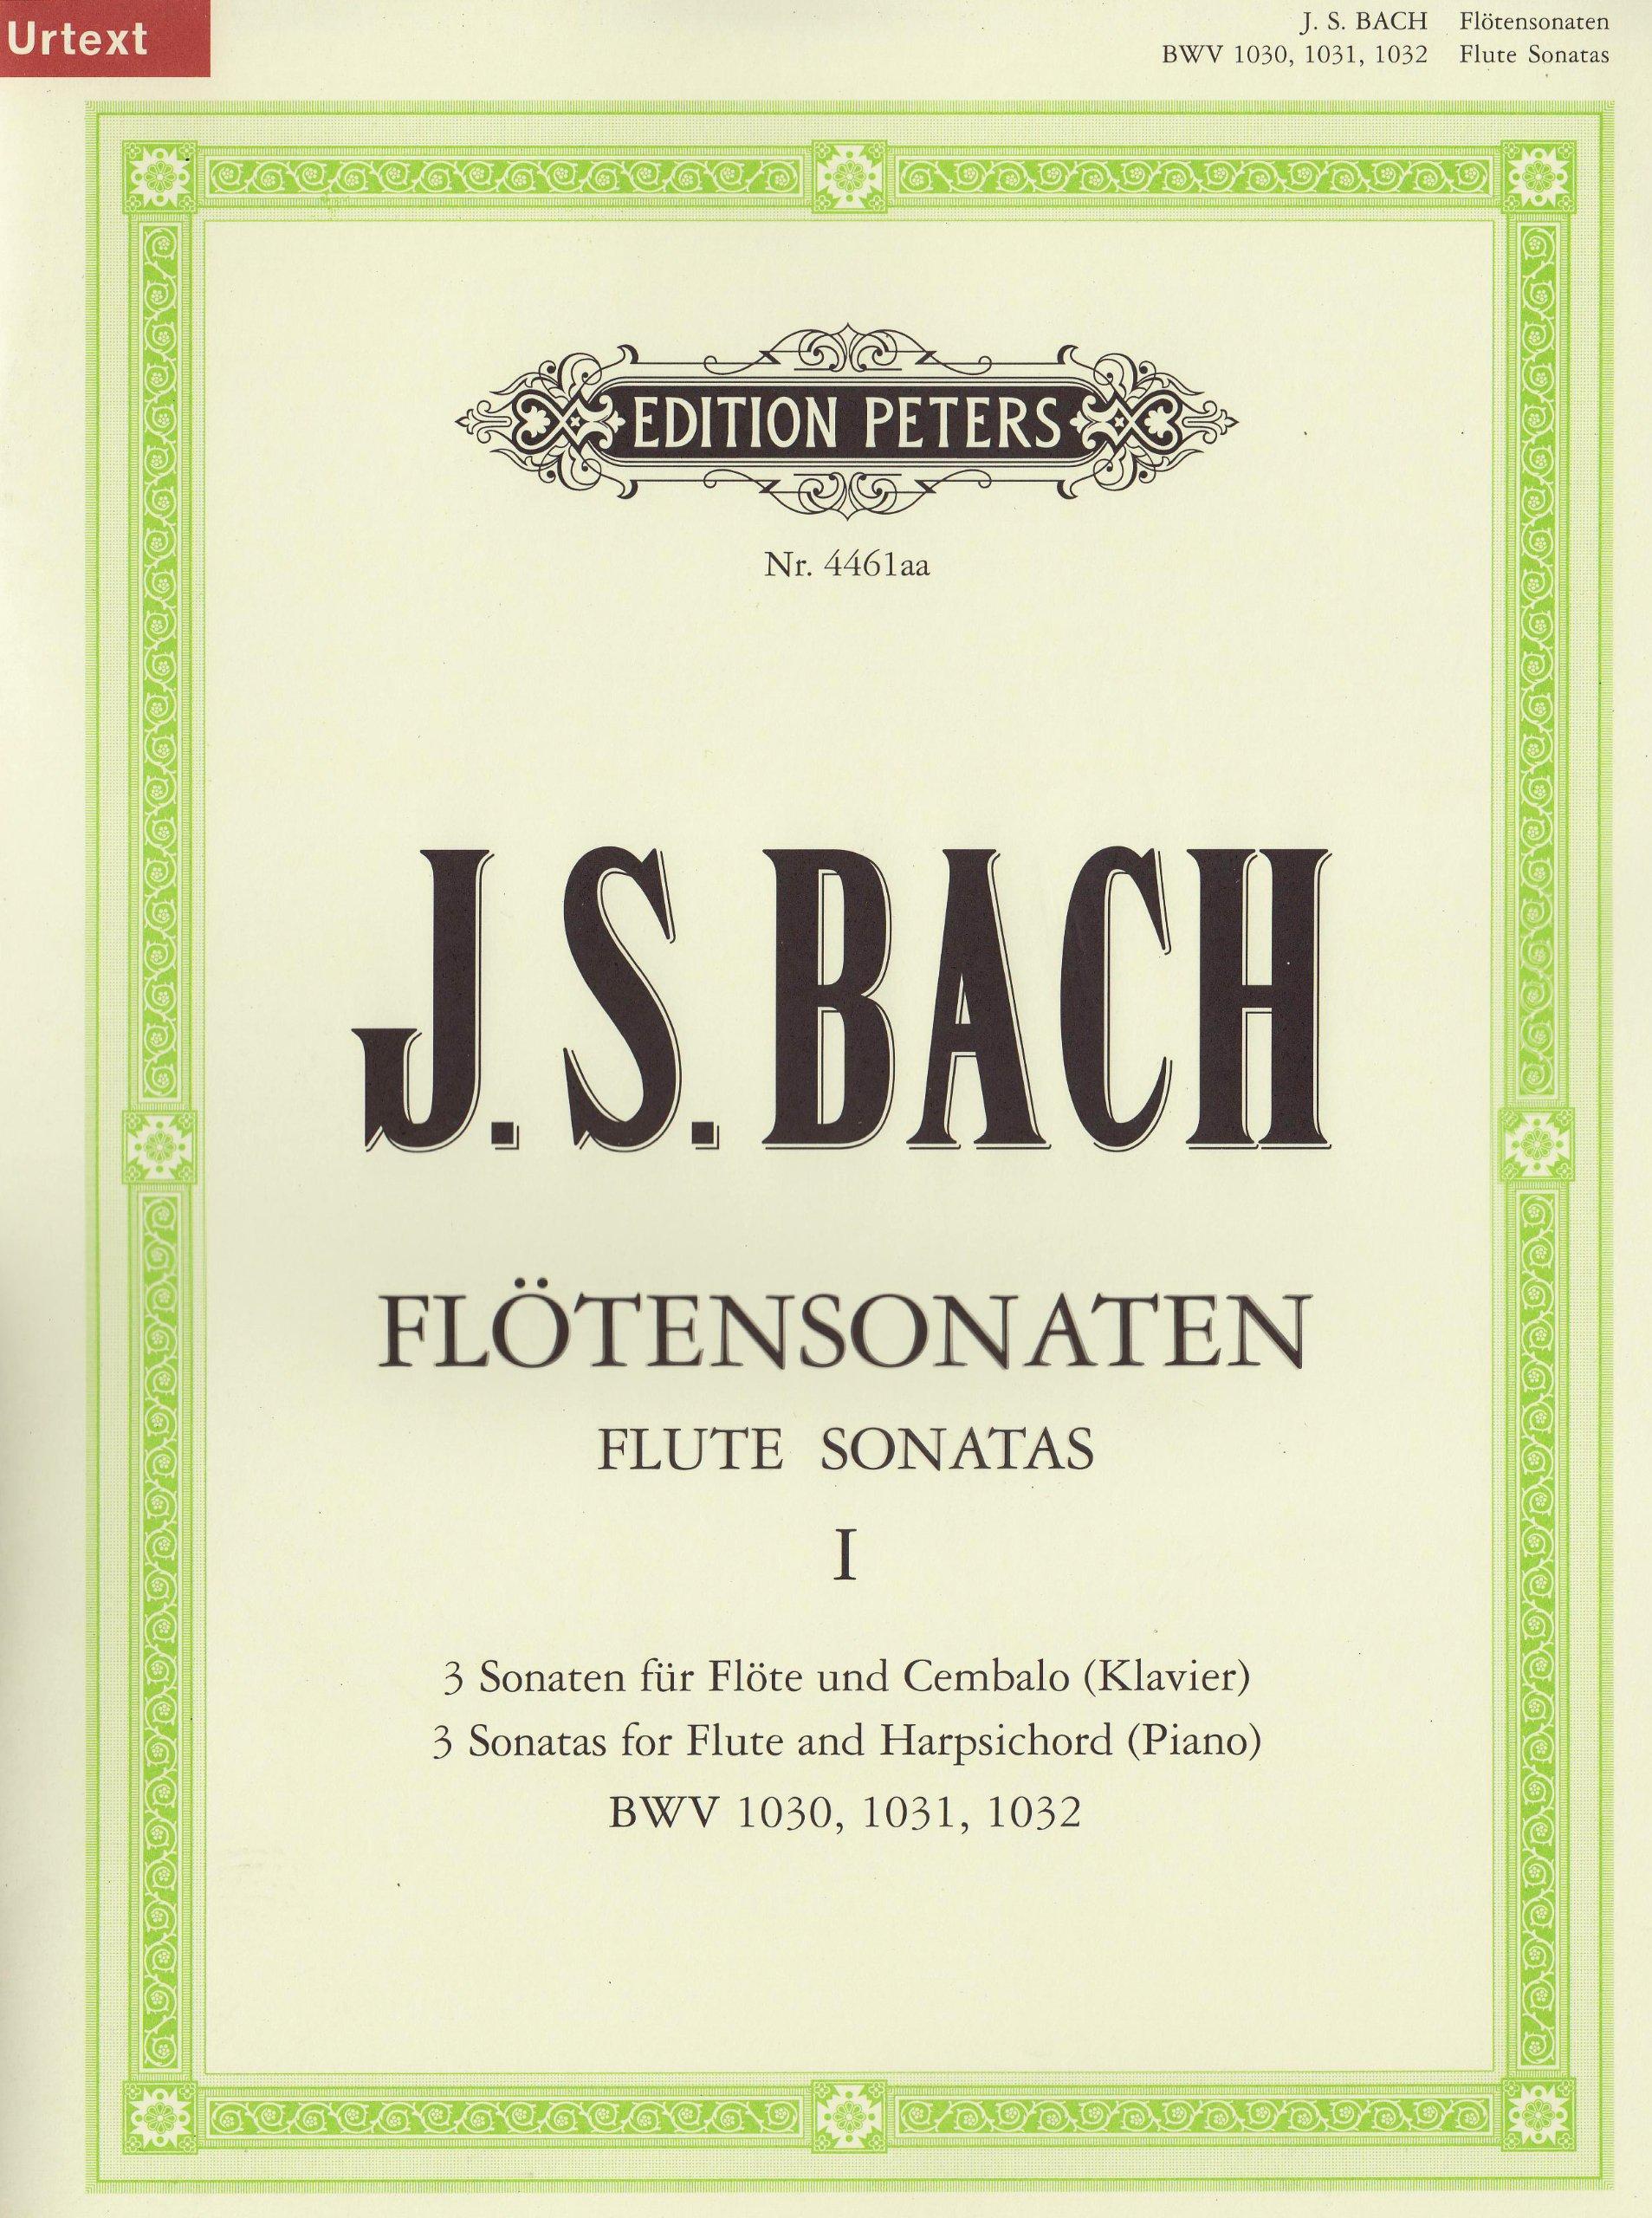 Sonaten Fur Flote Und Cembalo Bwv 1030 - 1032 Flûte Traversiere (Allemand) Brochure – 1 janvier 2000 Johann Sebastian Bac Peters B00006M2JS Musikalien